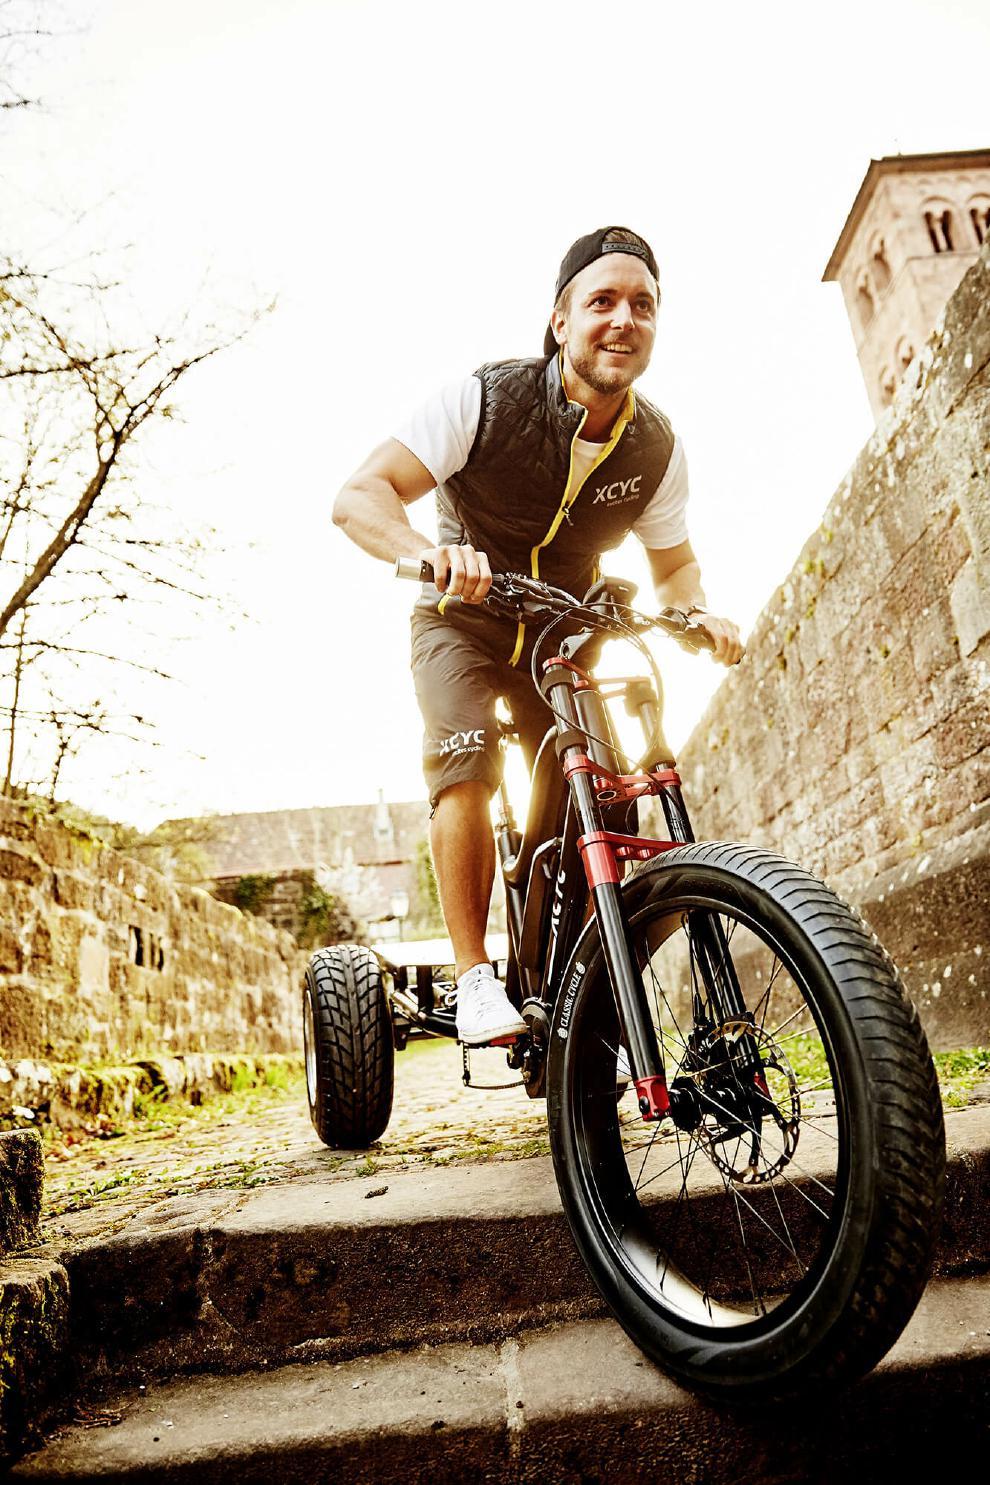 XCYC Lasten e-Bike Pick-Up Performance 2018